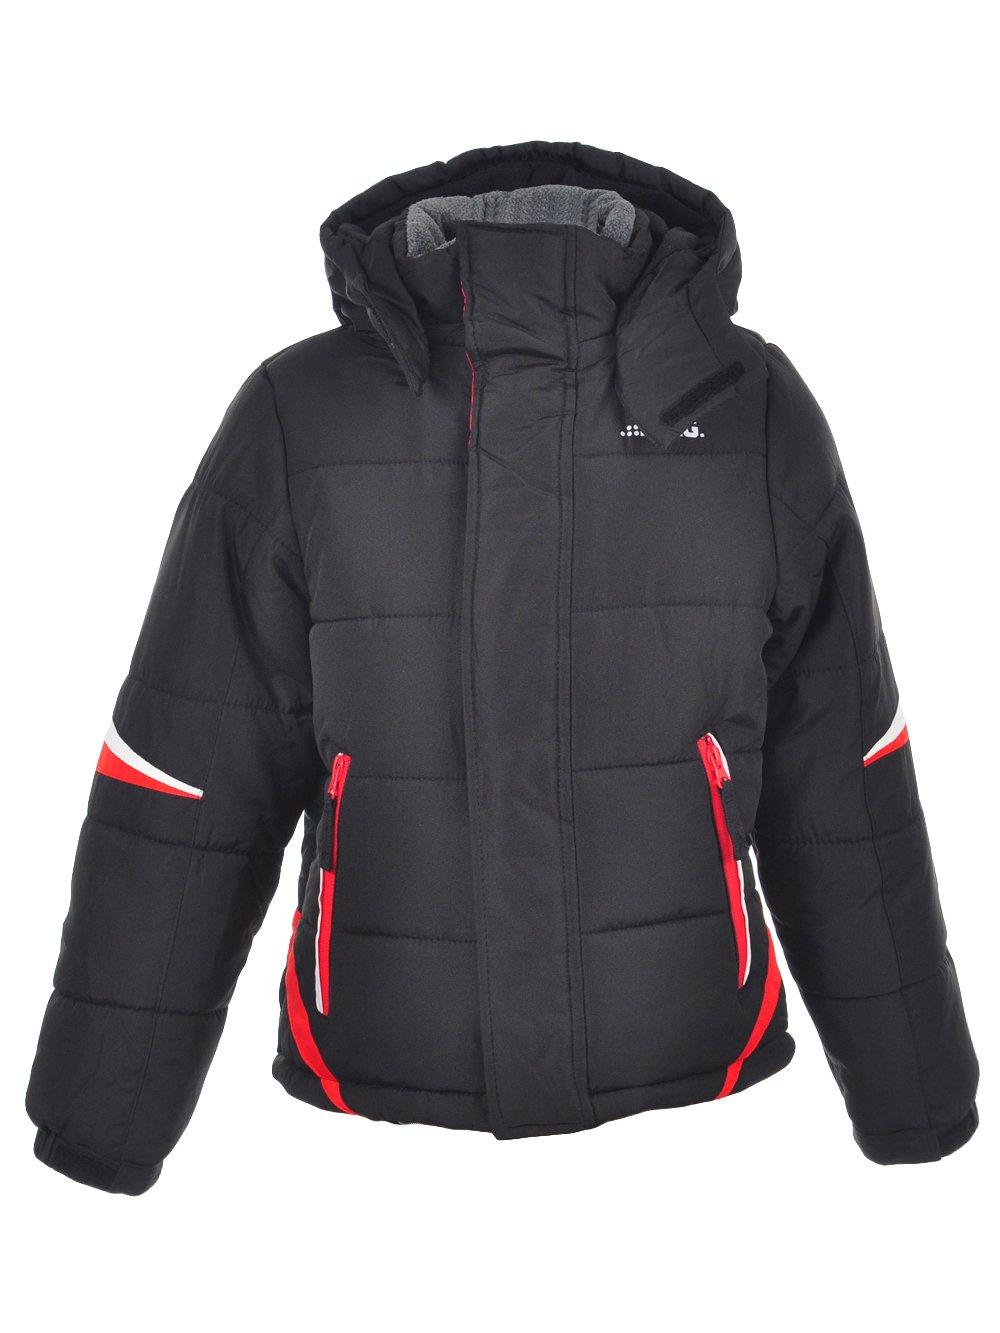 London Fog Big Boys' Active Puffer Jacket Winter Coat, Super Black, 14/16